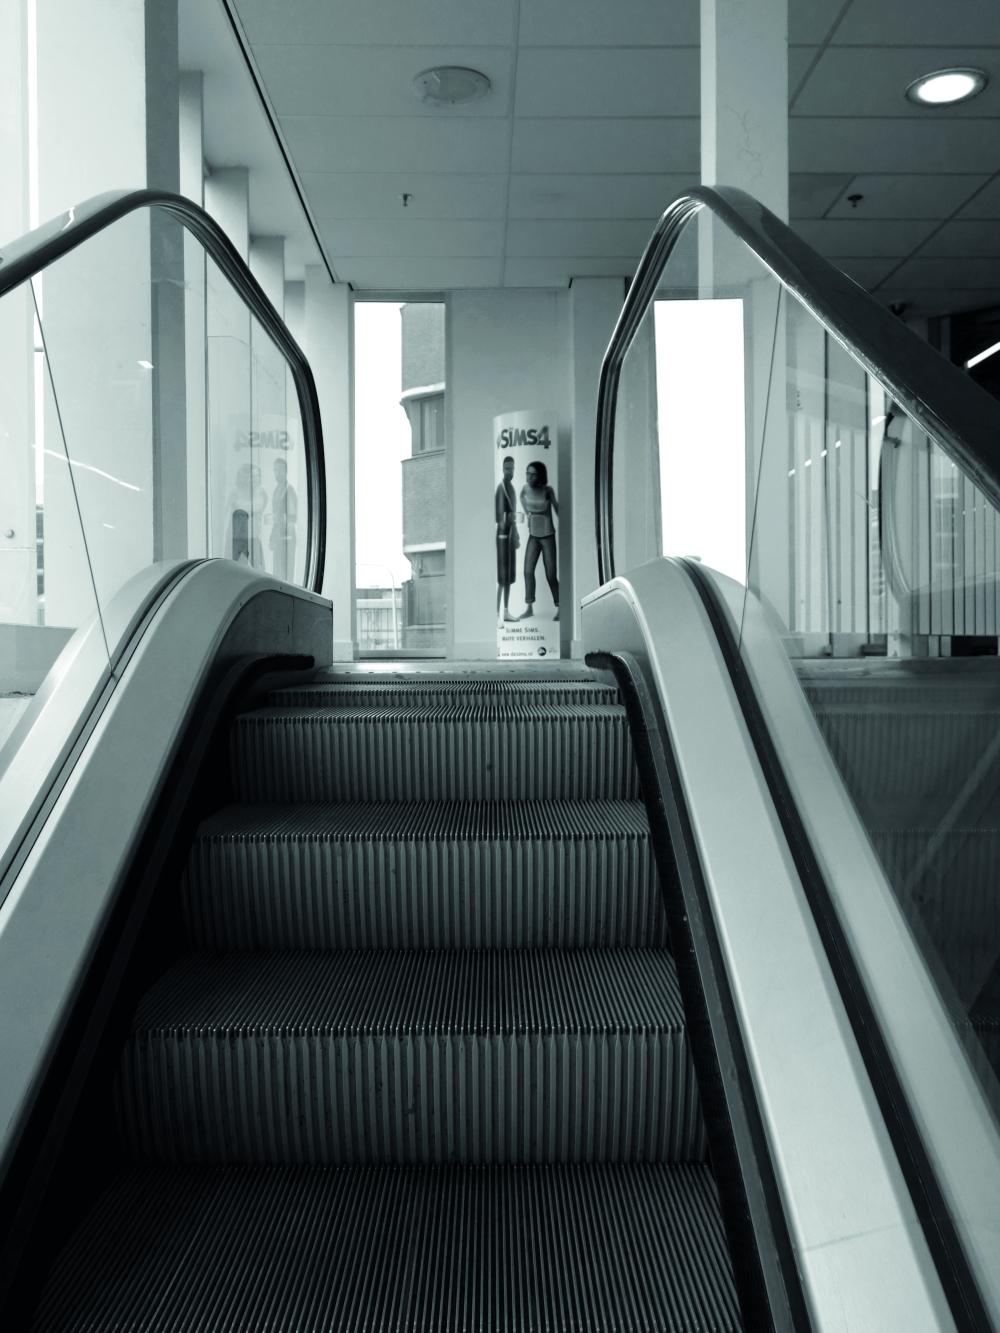 Monochrome Tuesday - escalator